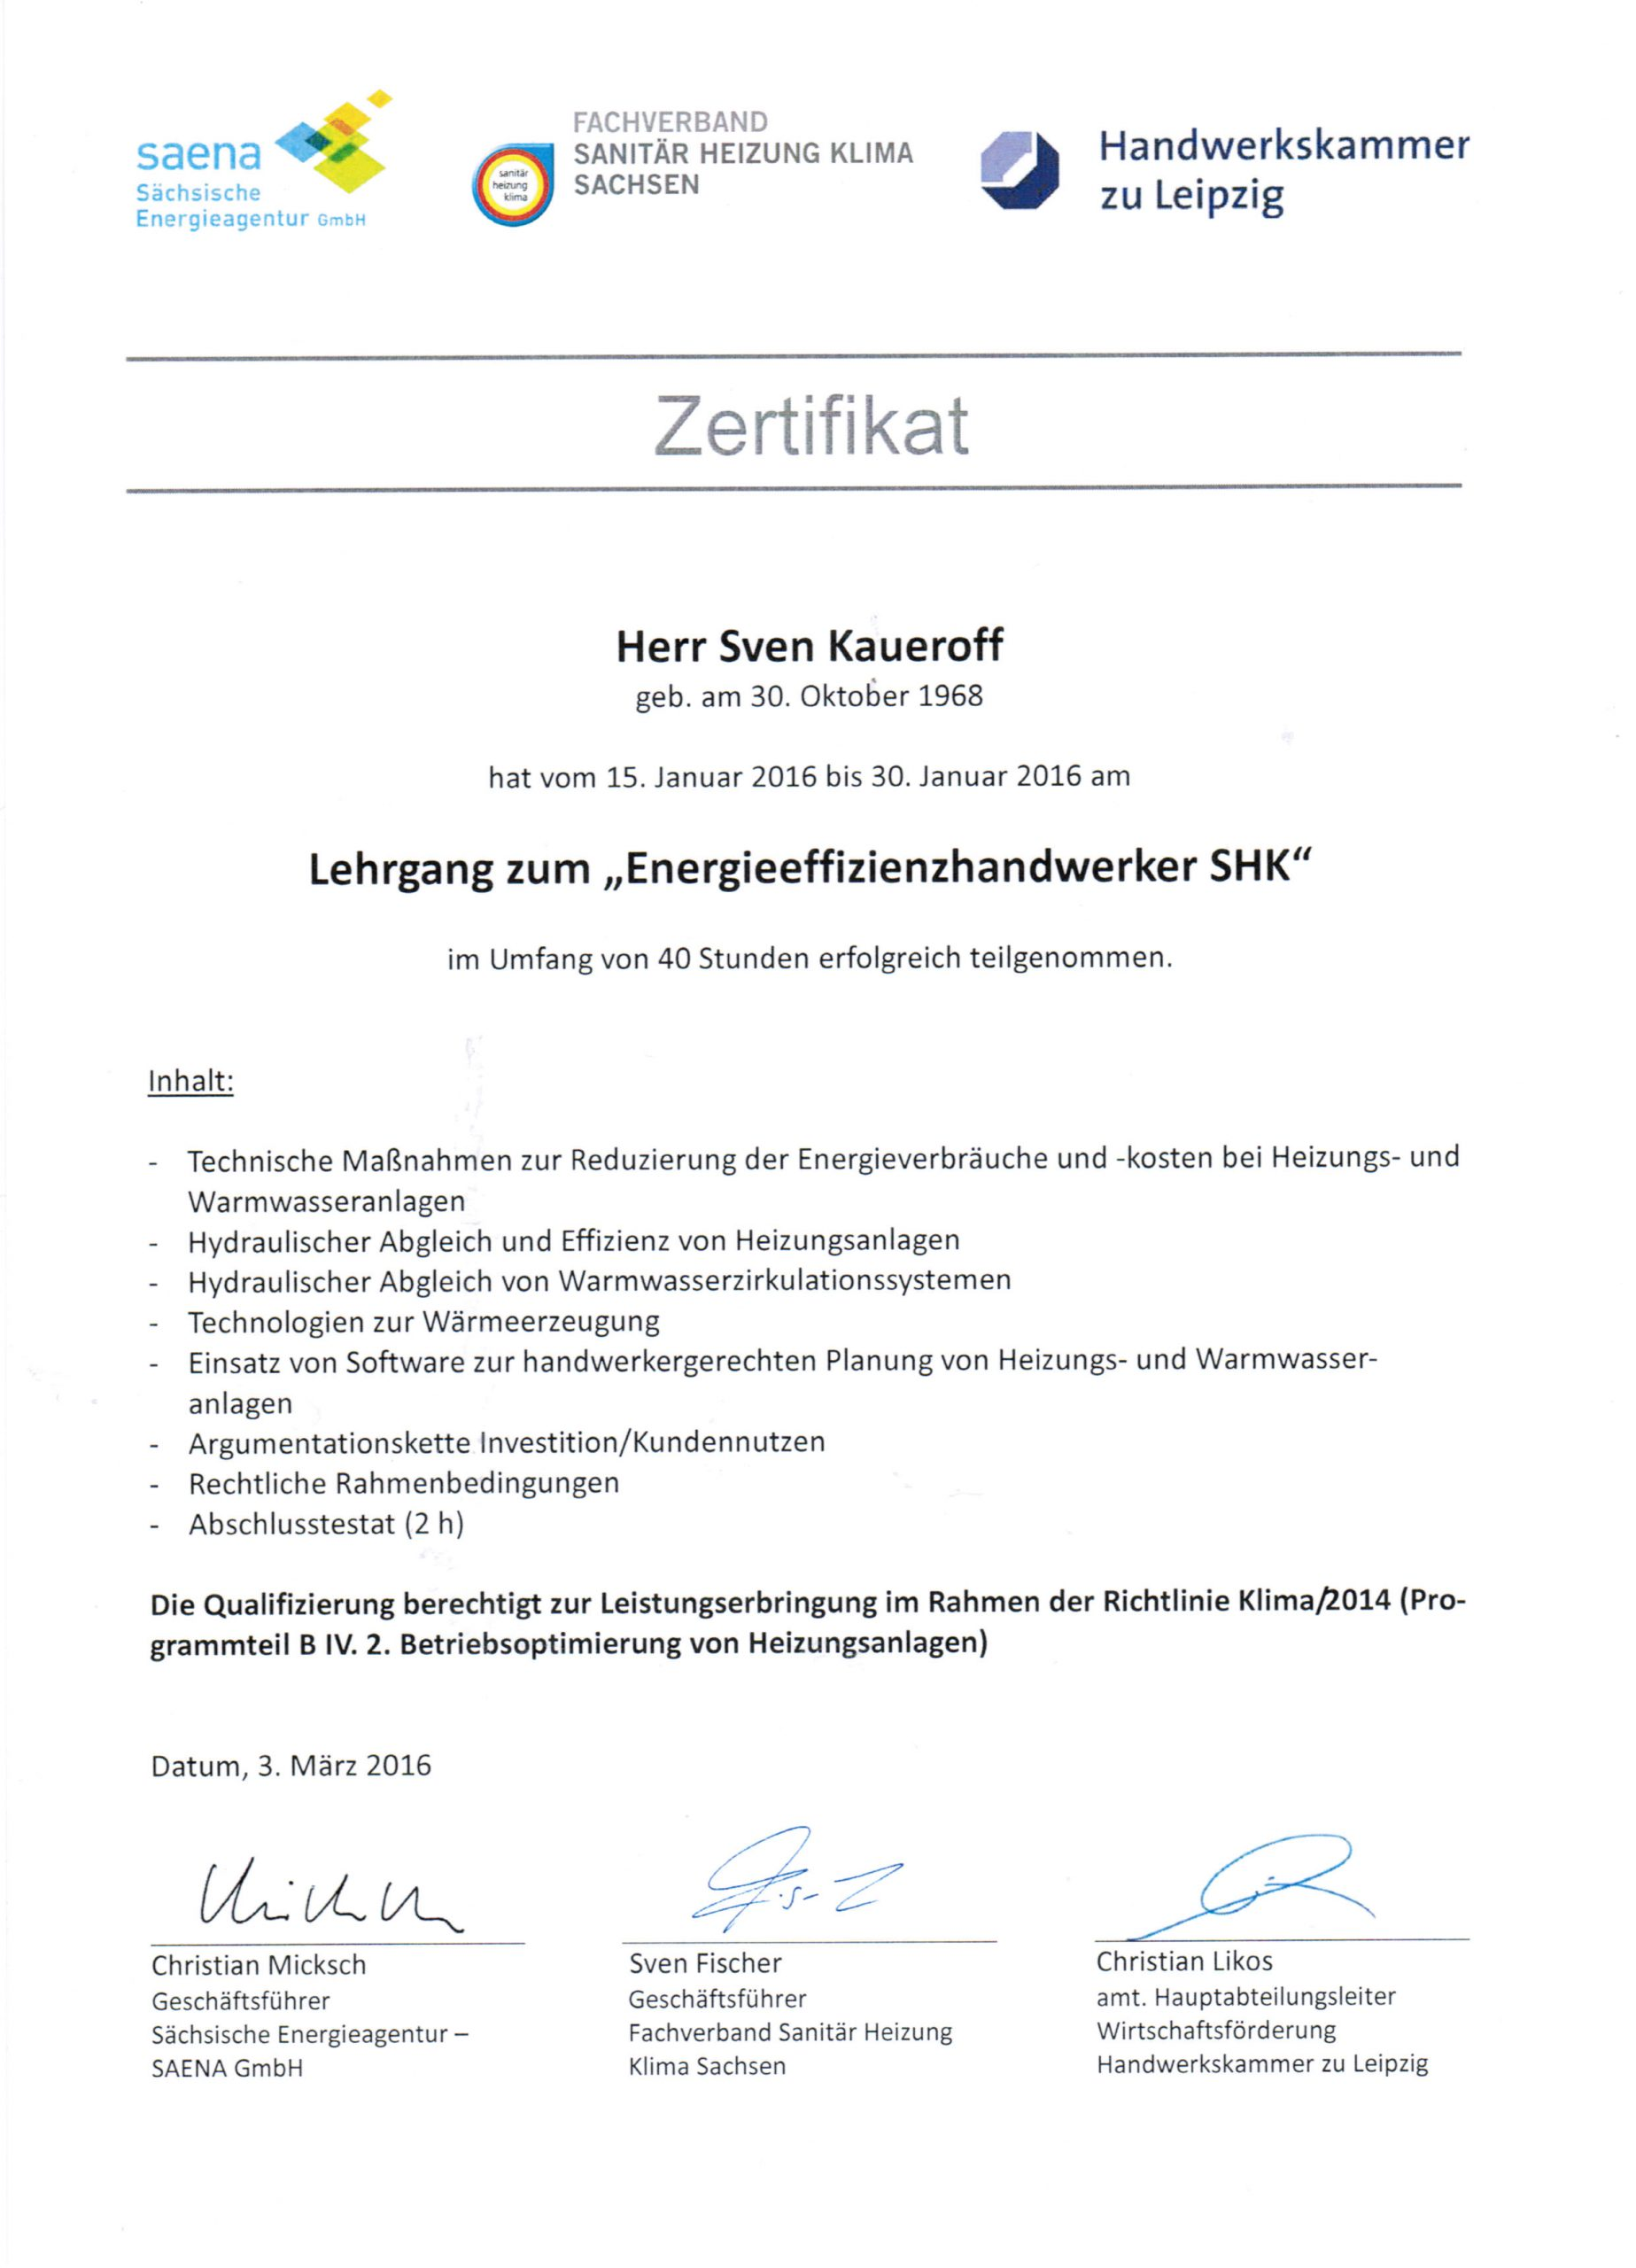 Zertifikat Effizienzhandwerker SHK